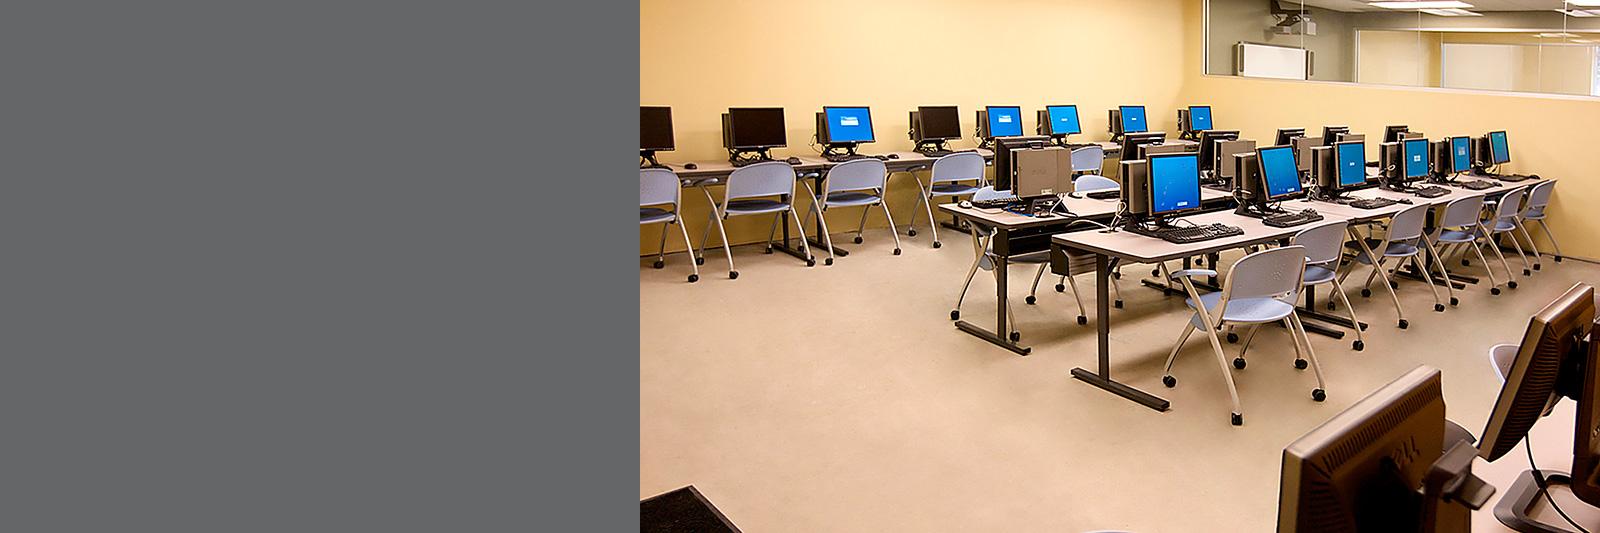 Компьютерные столы на заказ для школы